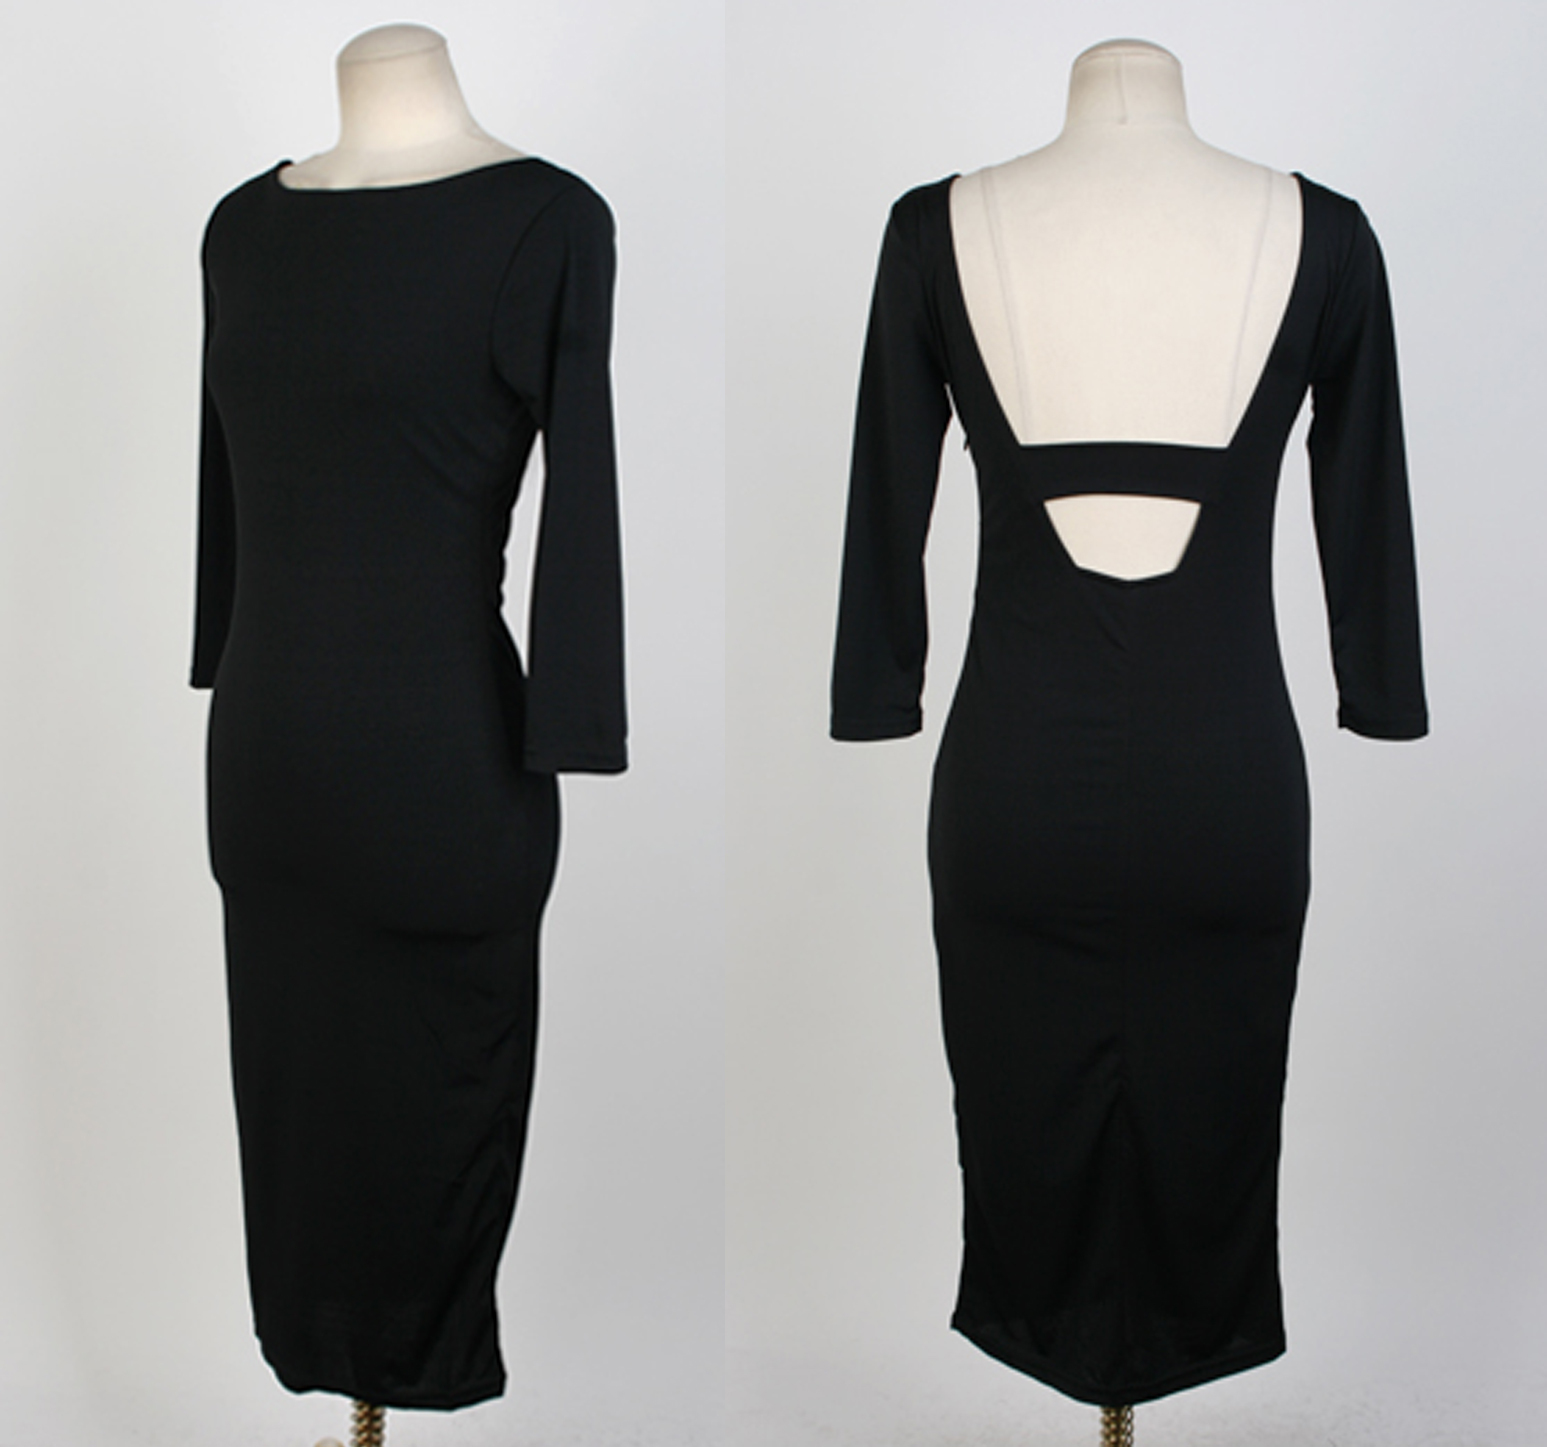 Feminine Backless Black Sheath Dress. Cocktail Party Slim Fit Black Dress. LBD